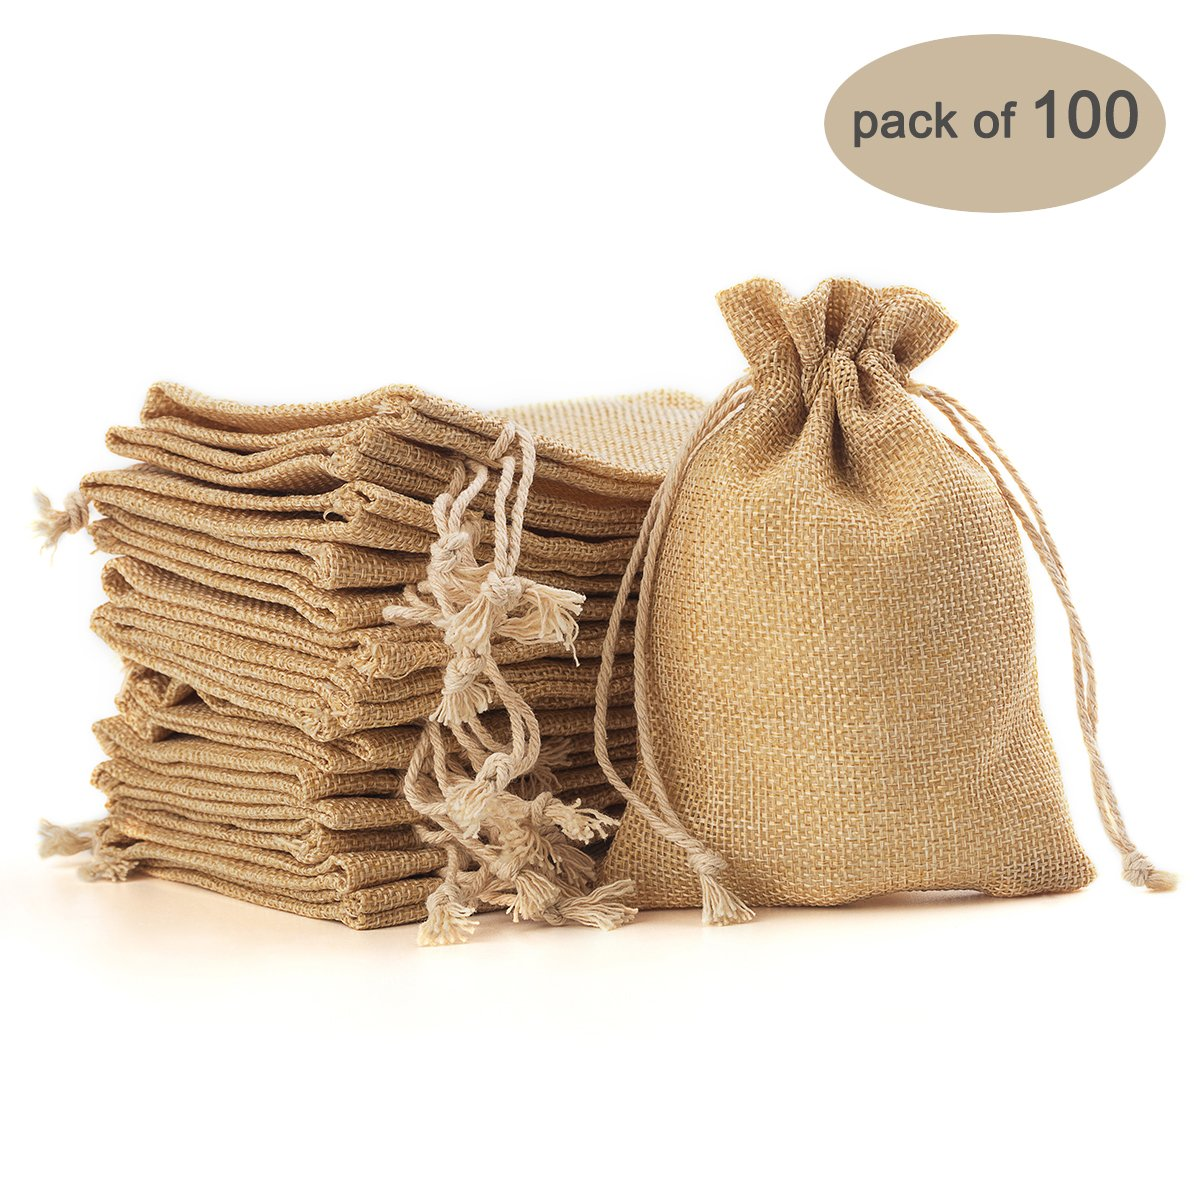 Dxhycc 100pcs thank you wedding brown kraft for Burlap bag craft ideas